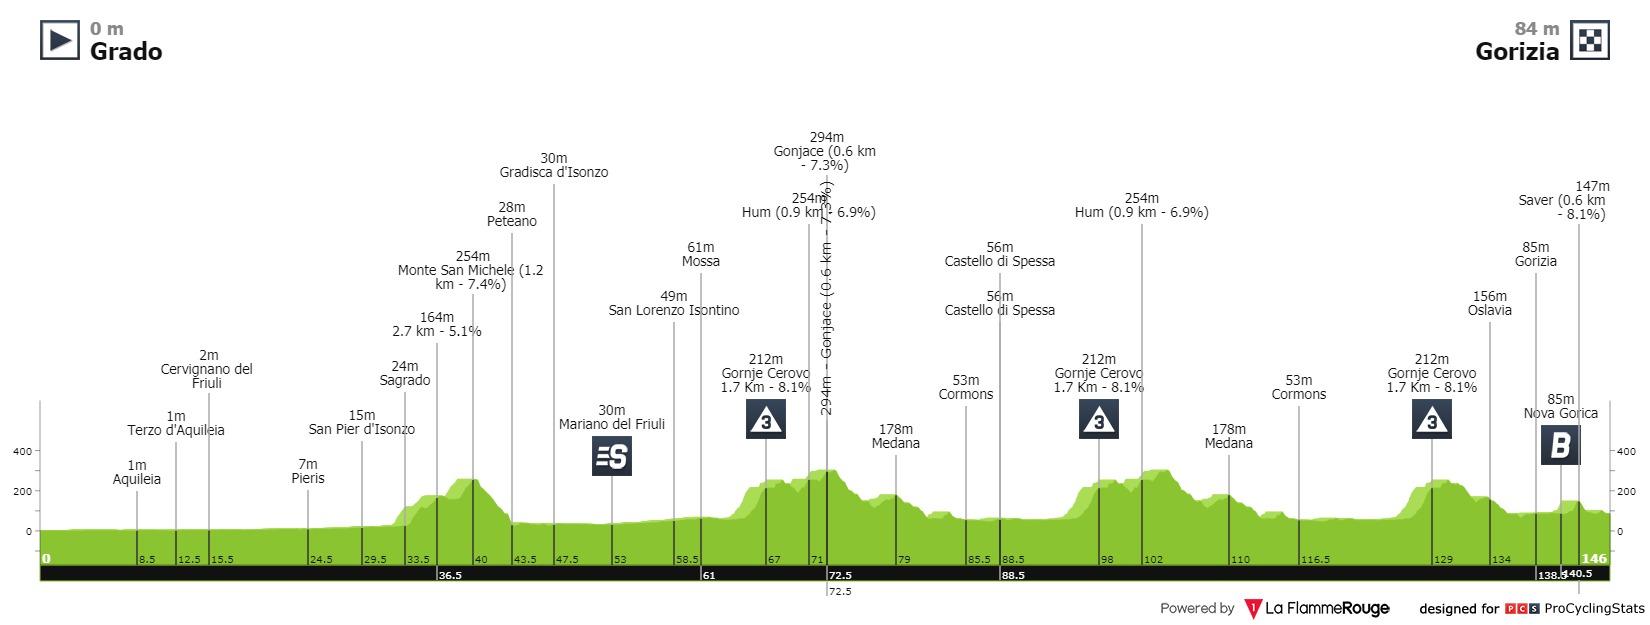 Campenaerts Giro d'Italia